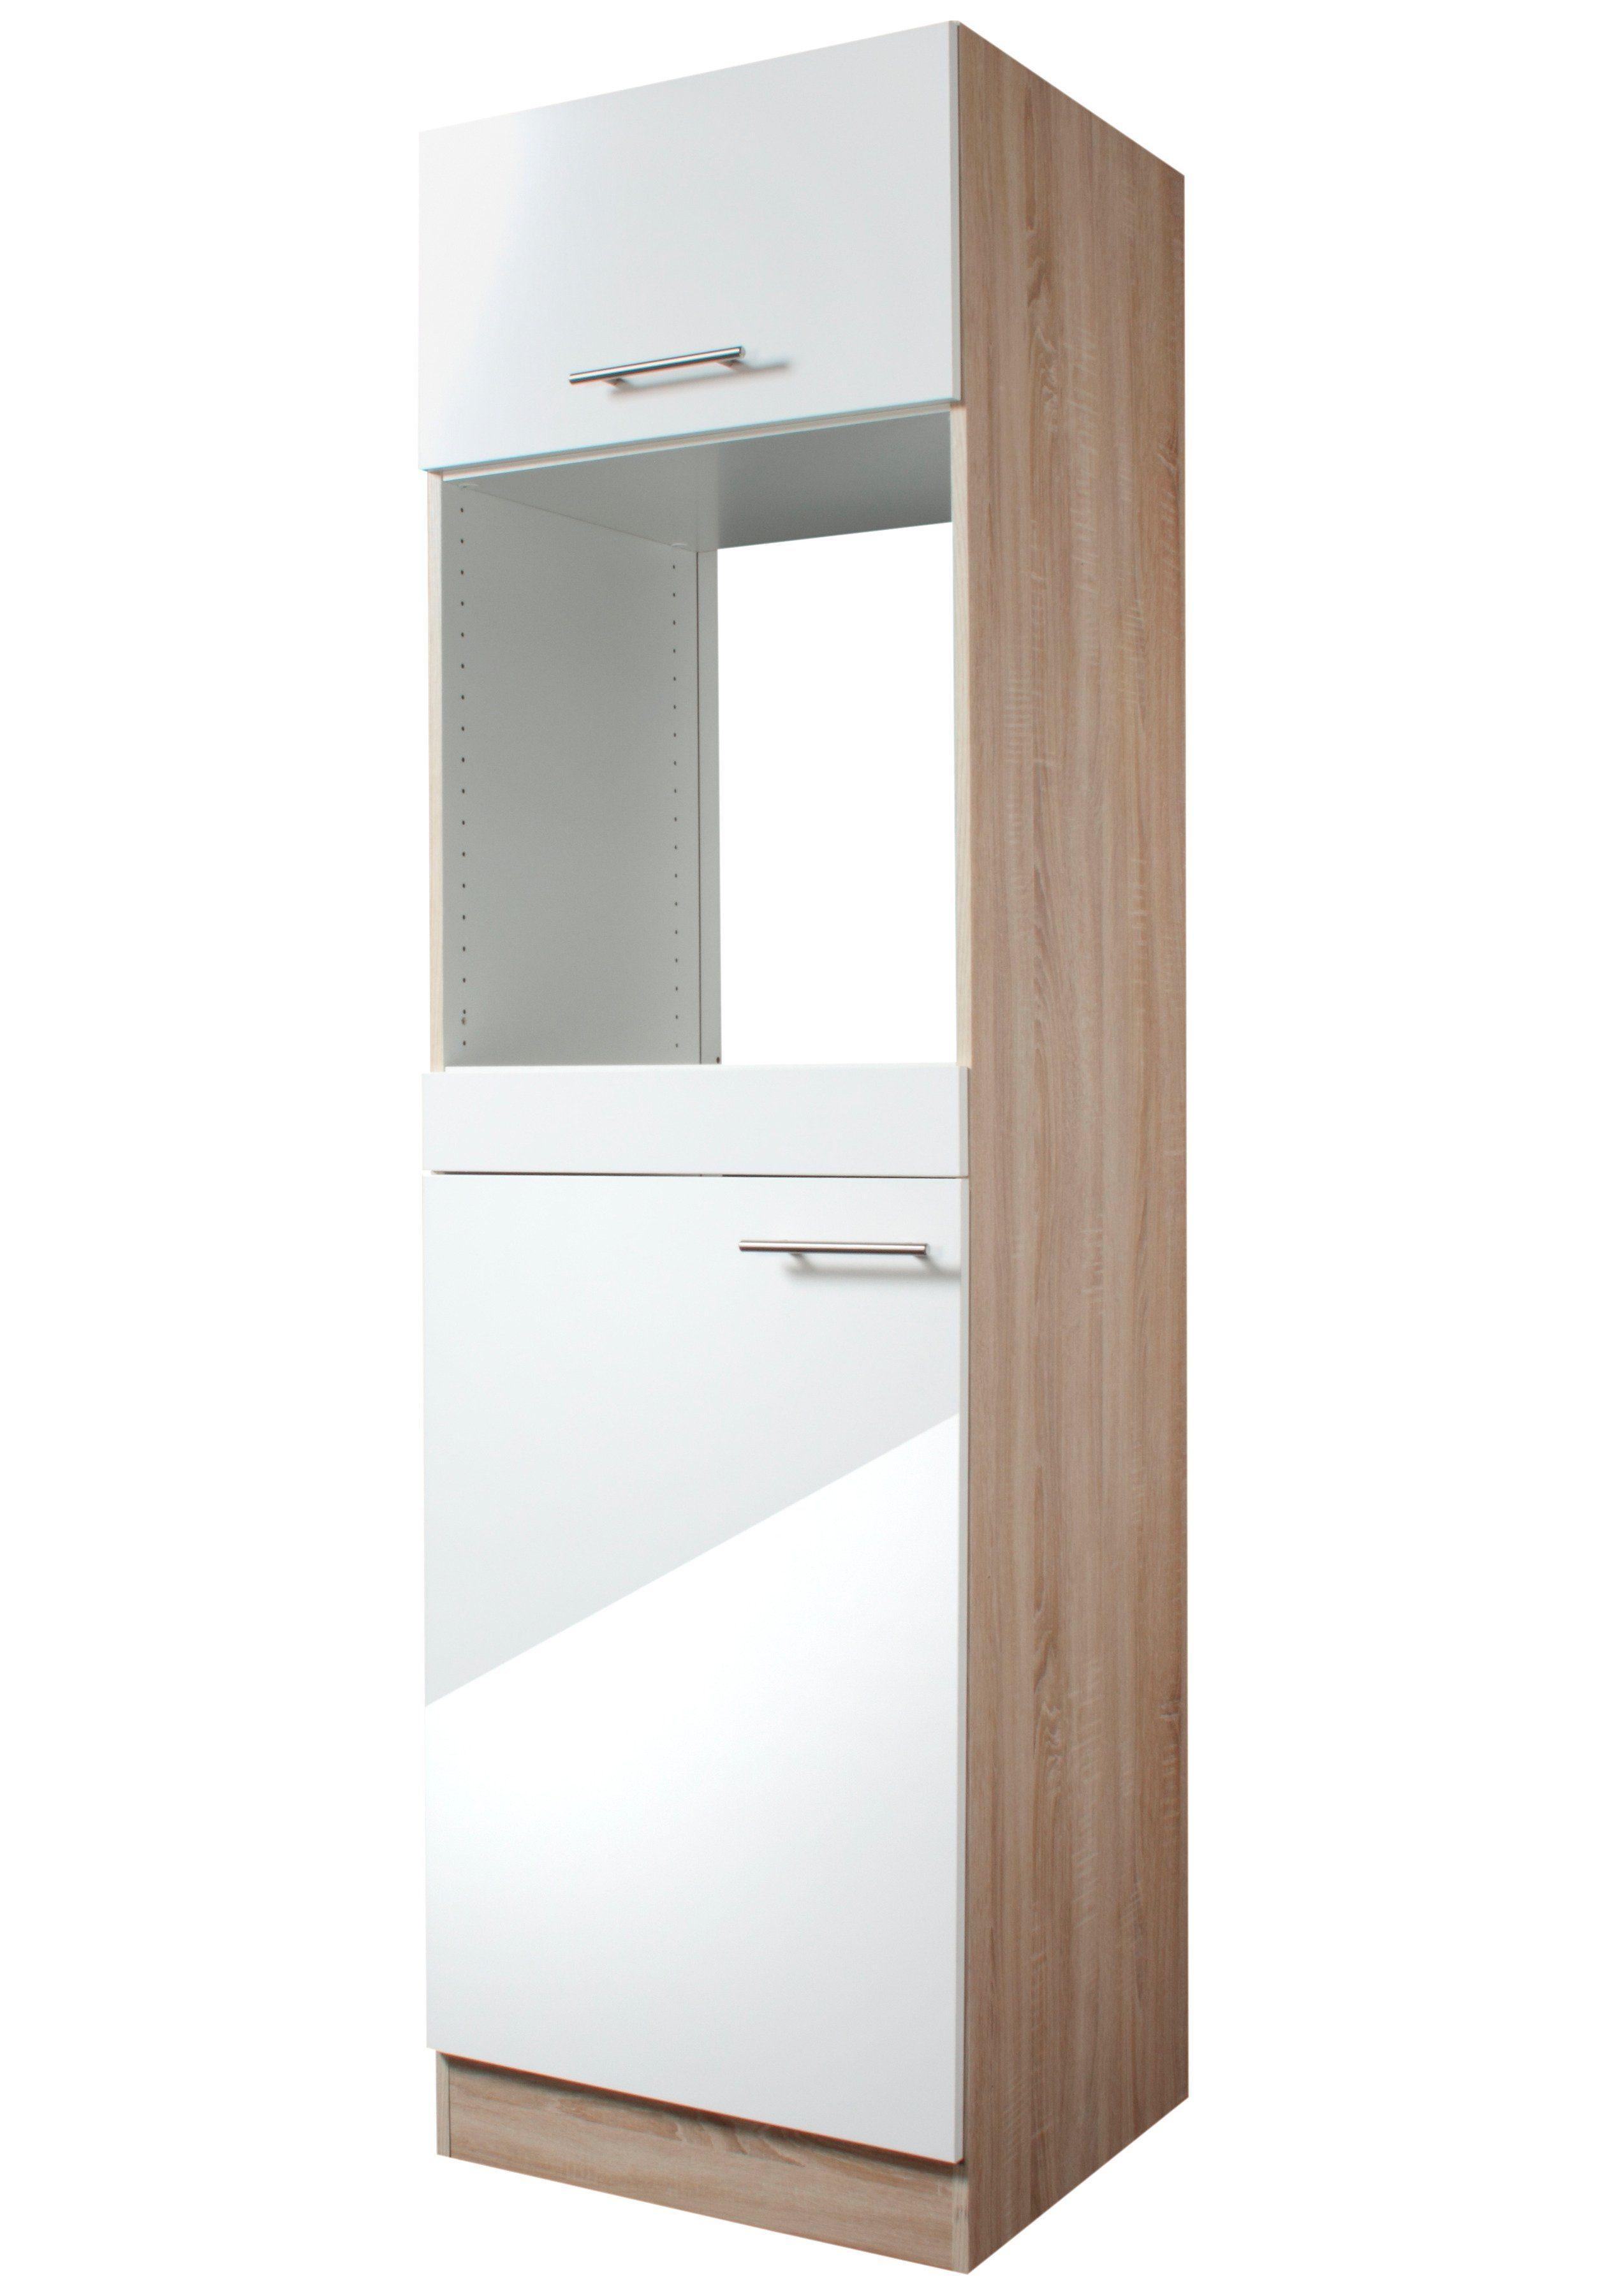 OPTIFIT Kombinierter Backofen-Kühlumbauschrank »Dakar, Höhe 206,8 cm«